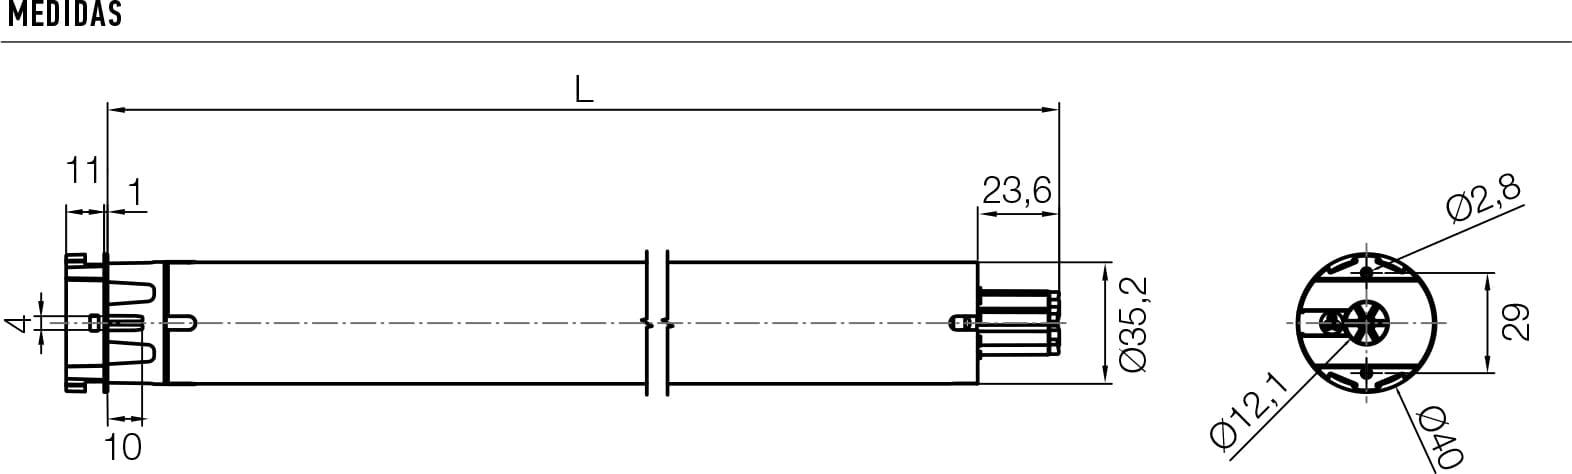 caracteristicas-era-star-st-2